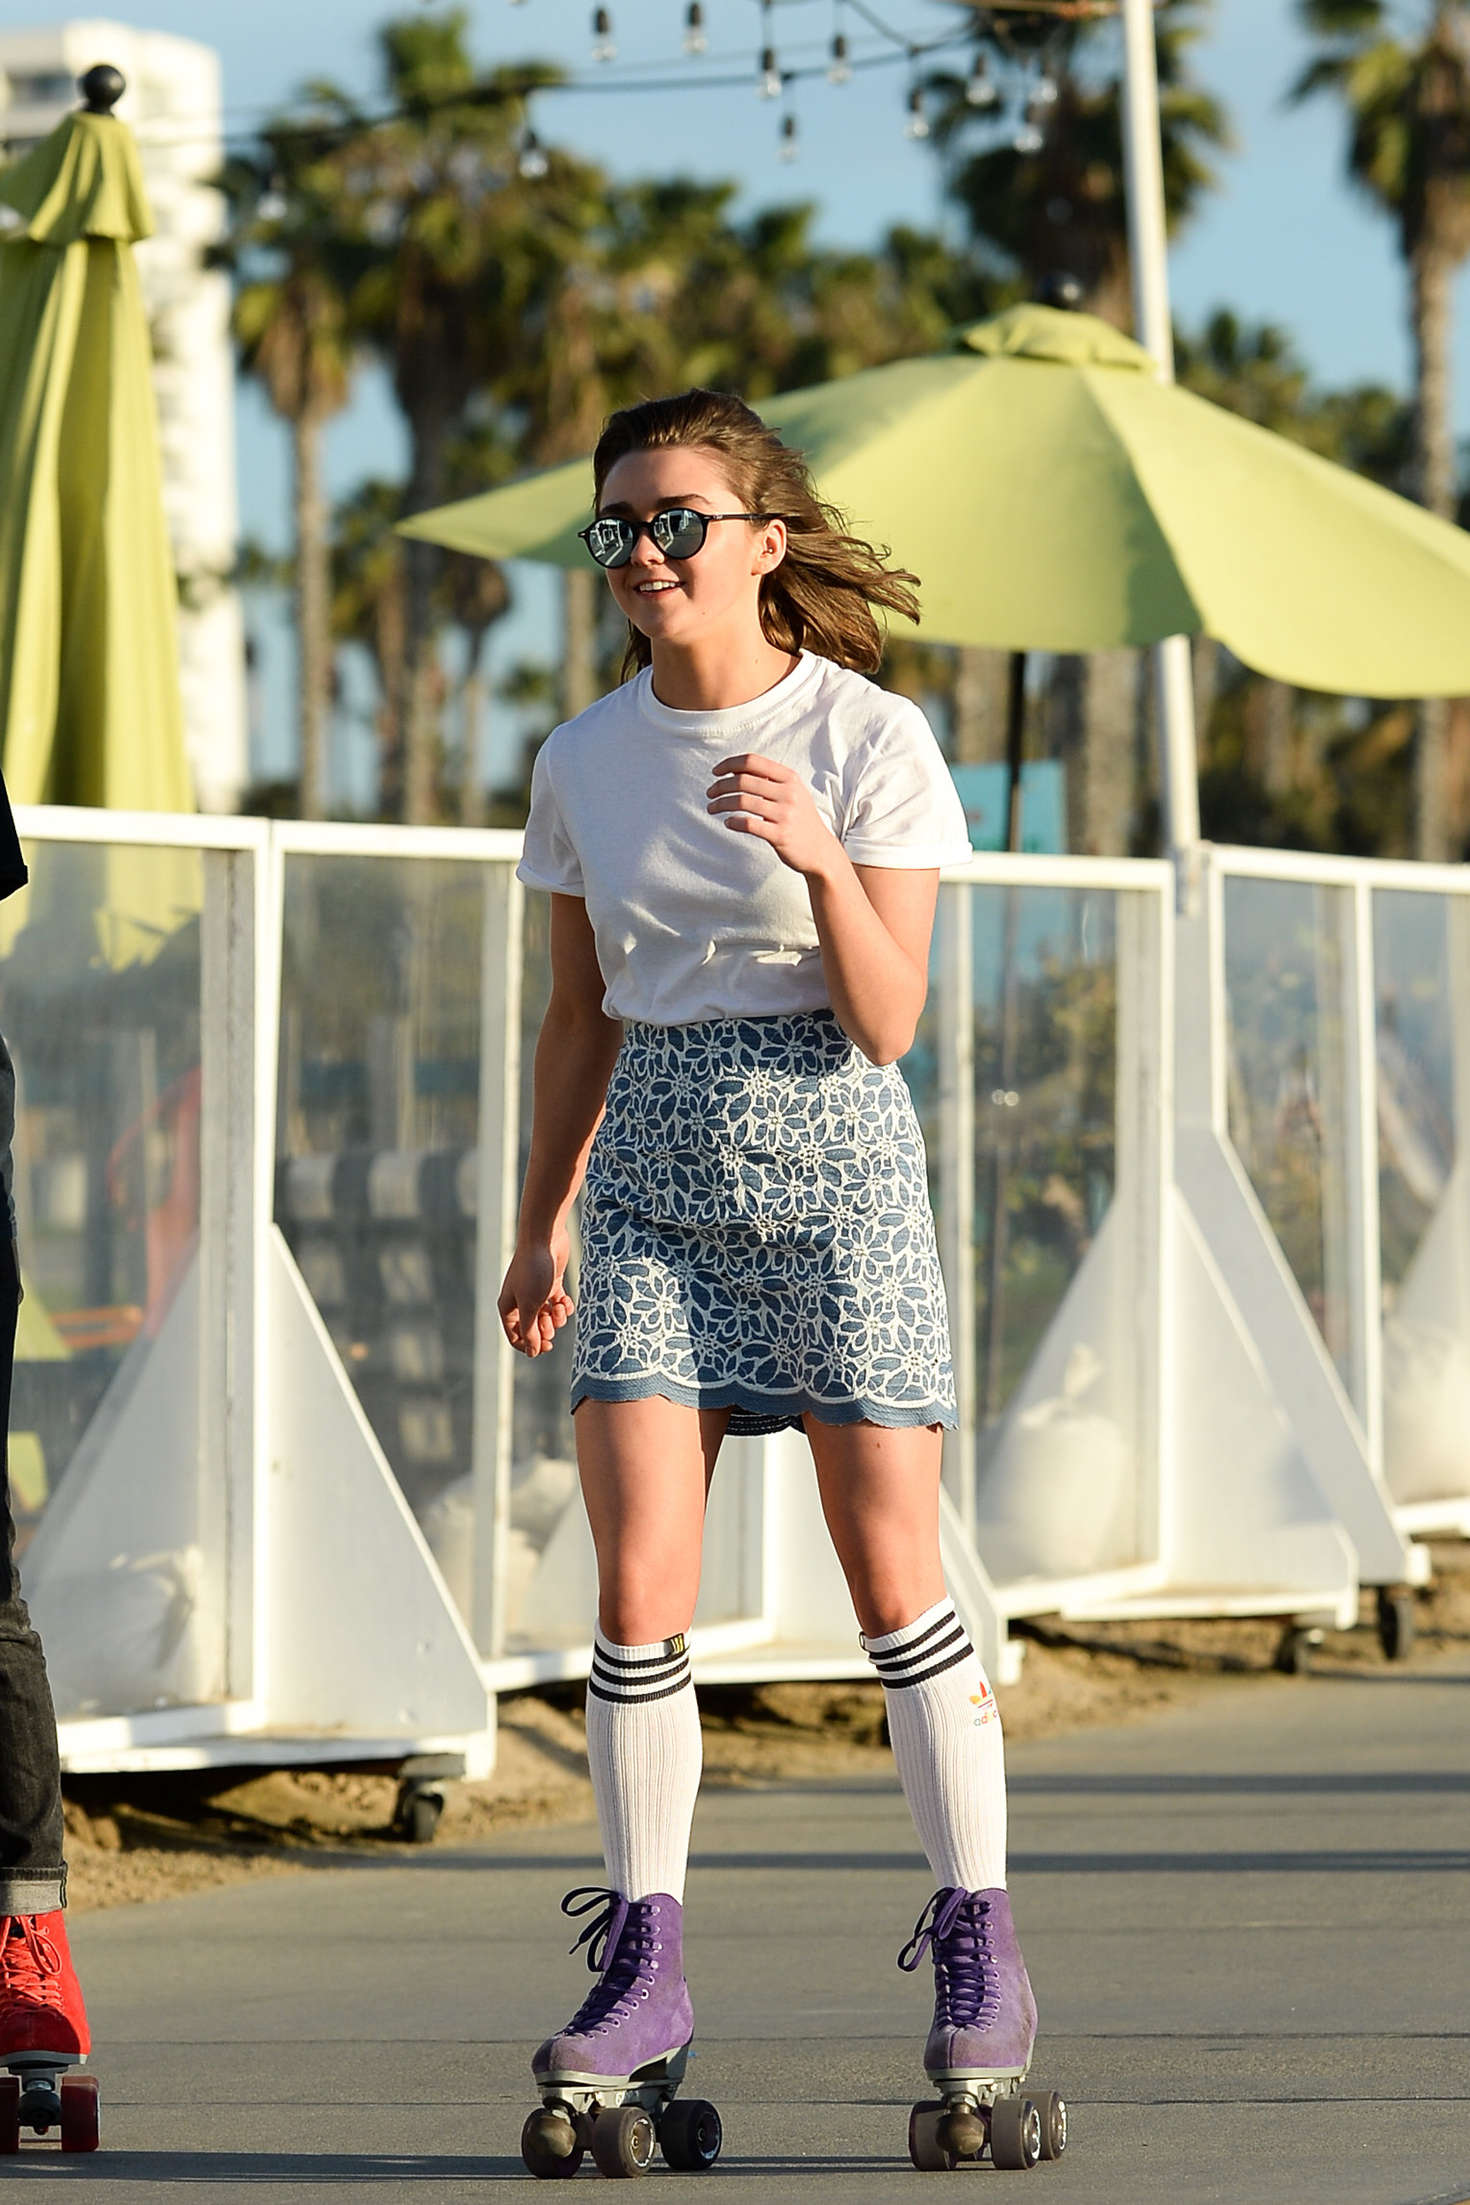 Roller skating kendall - Maisie Williams In Mini Skirt Roller Skating